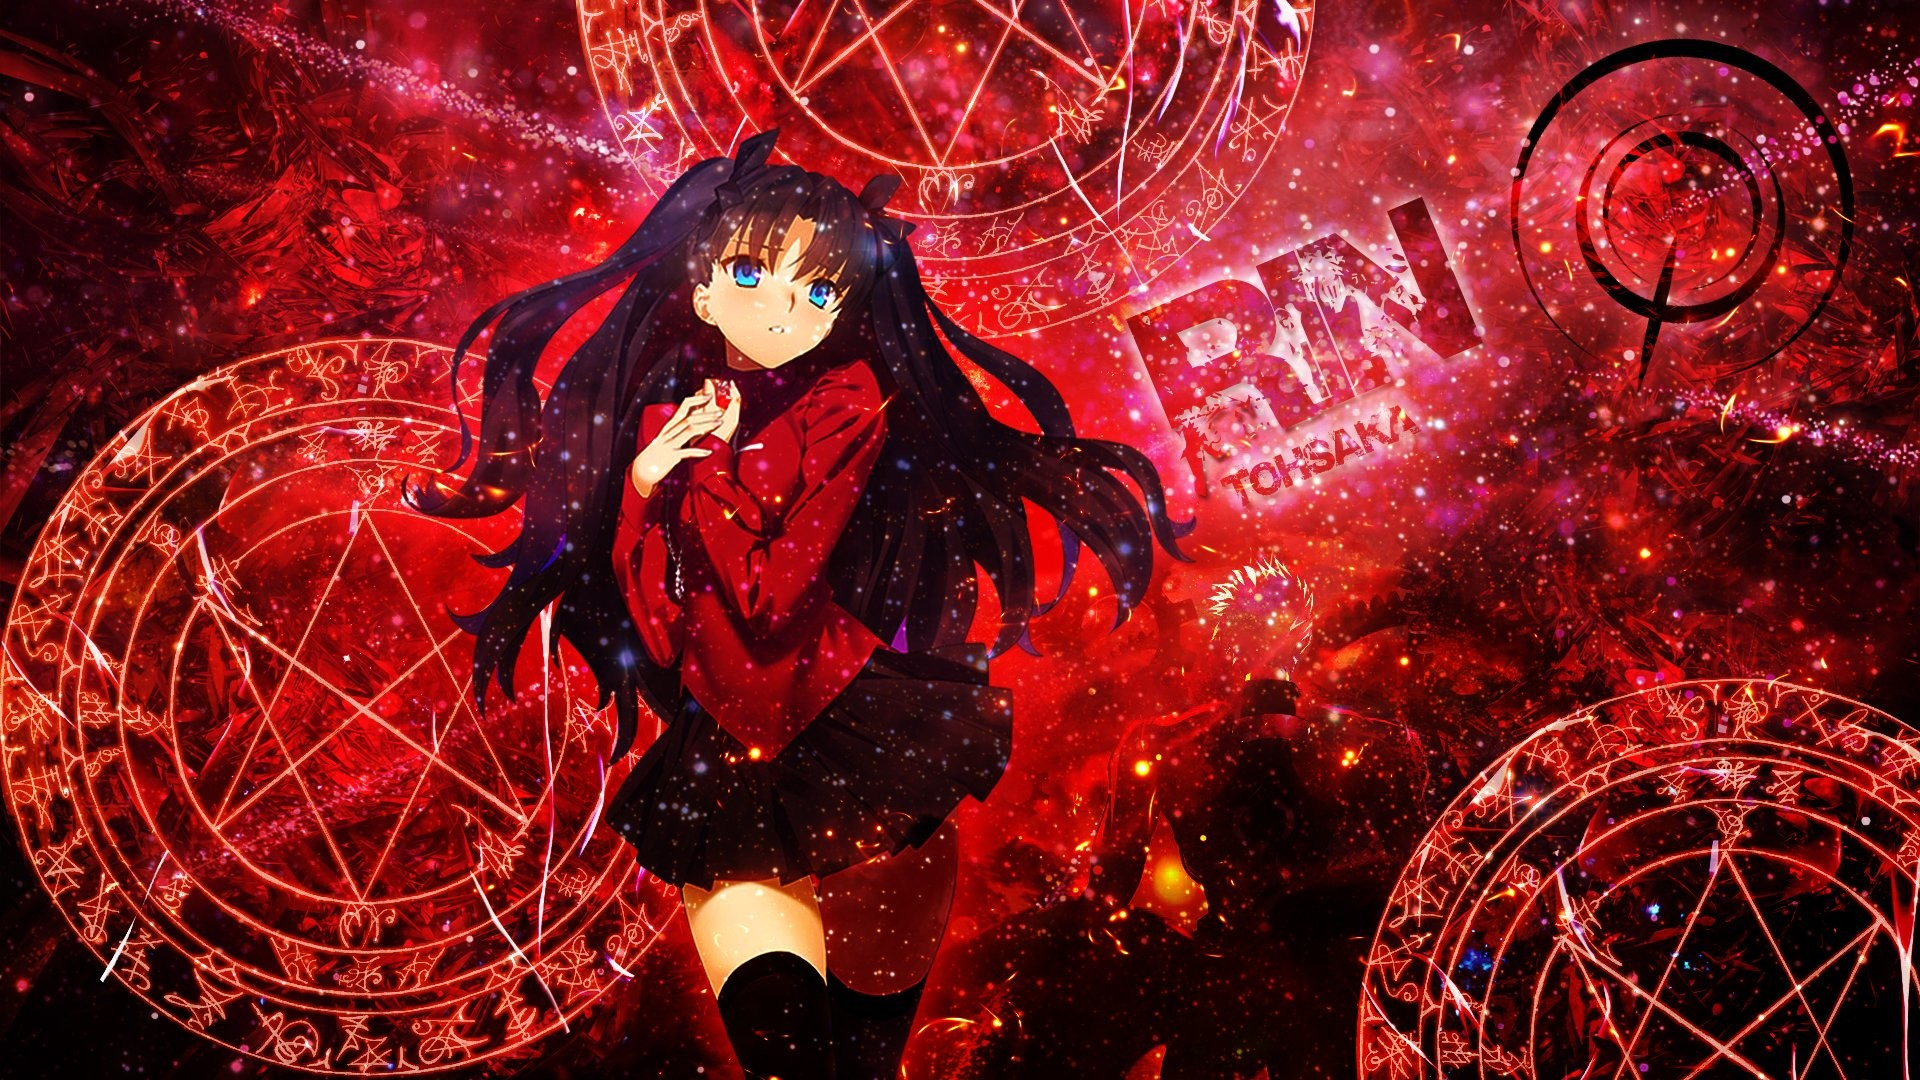 … Unlimited Blade Works Rin Tohsaka · HD Wallpaper | Background ID:629534